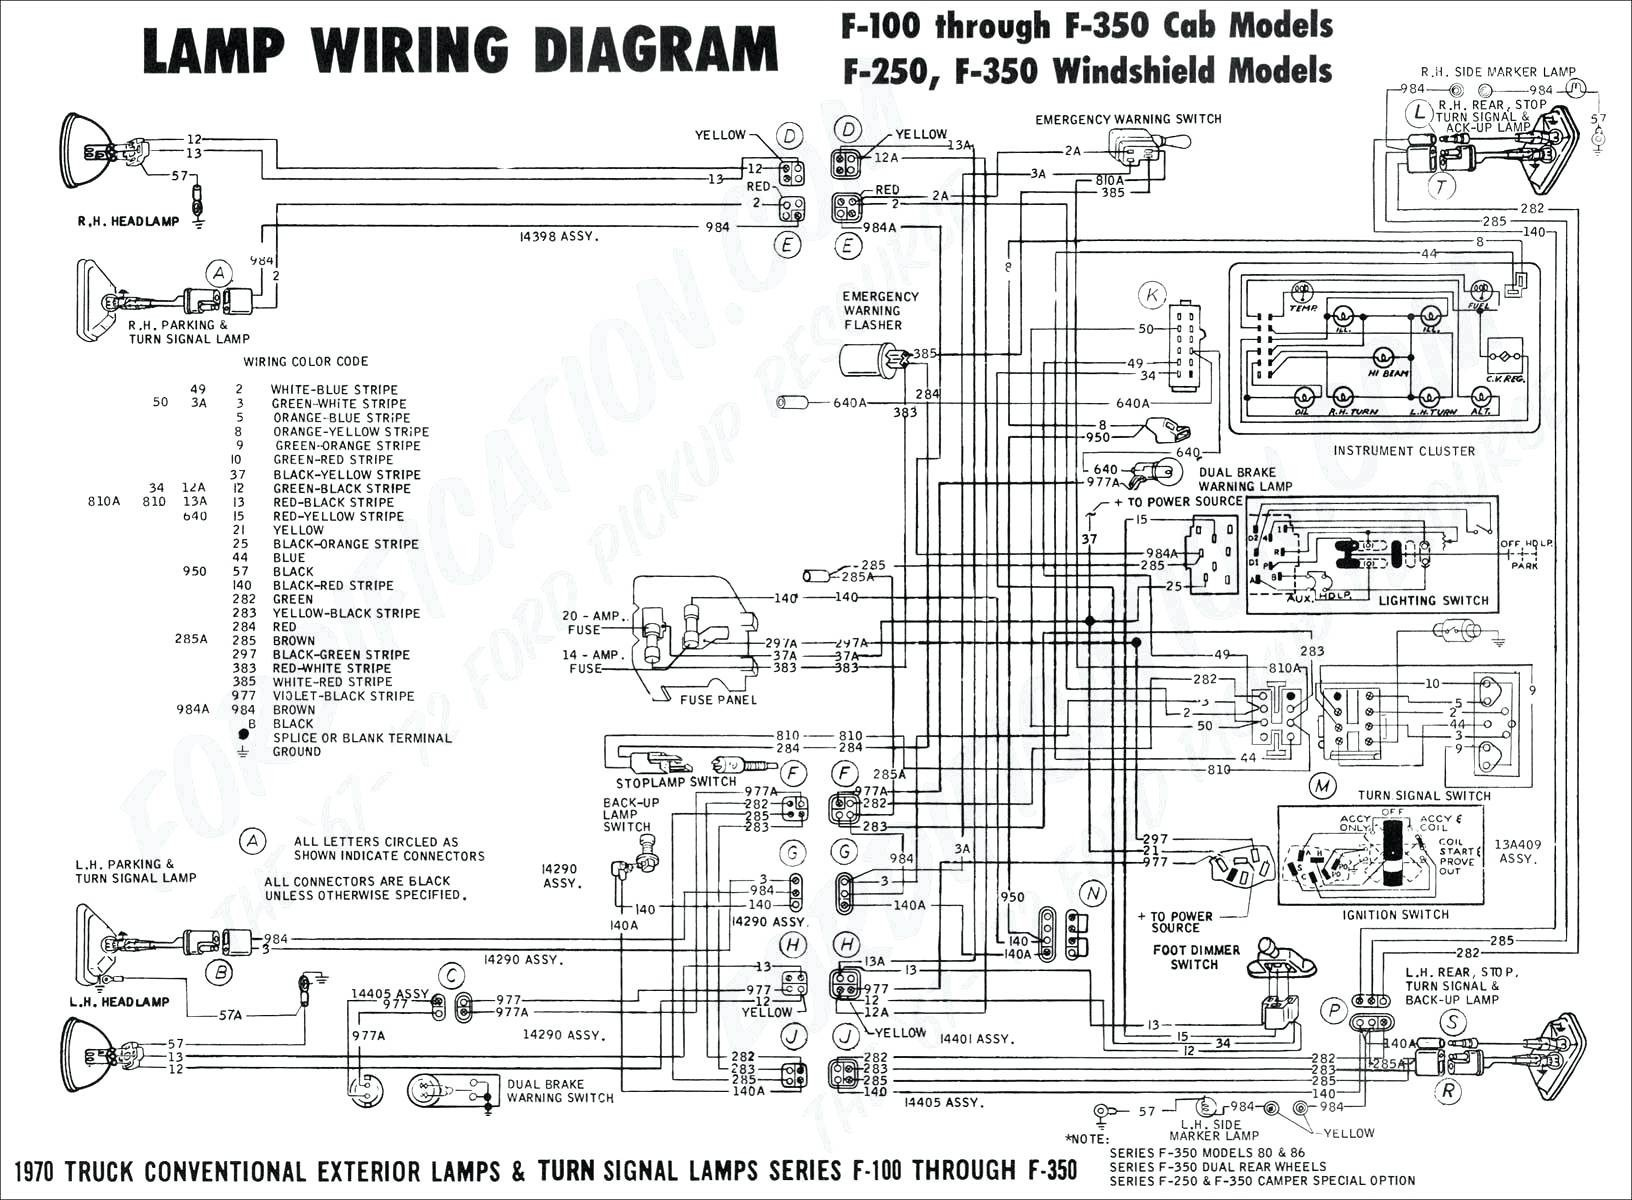 Ford Contour Engine Diagram 2000 ford Contour Transmission Diagram Simple Guide About Of Ford Contour Engine Diagram